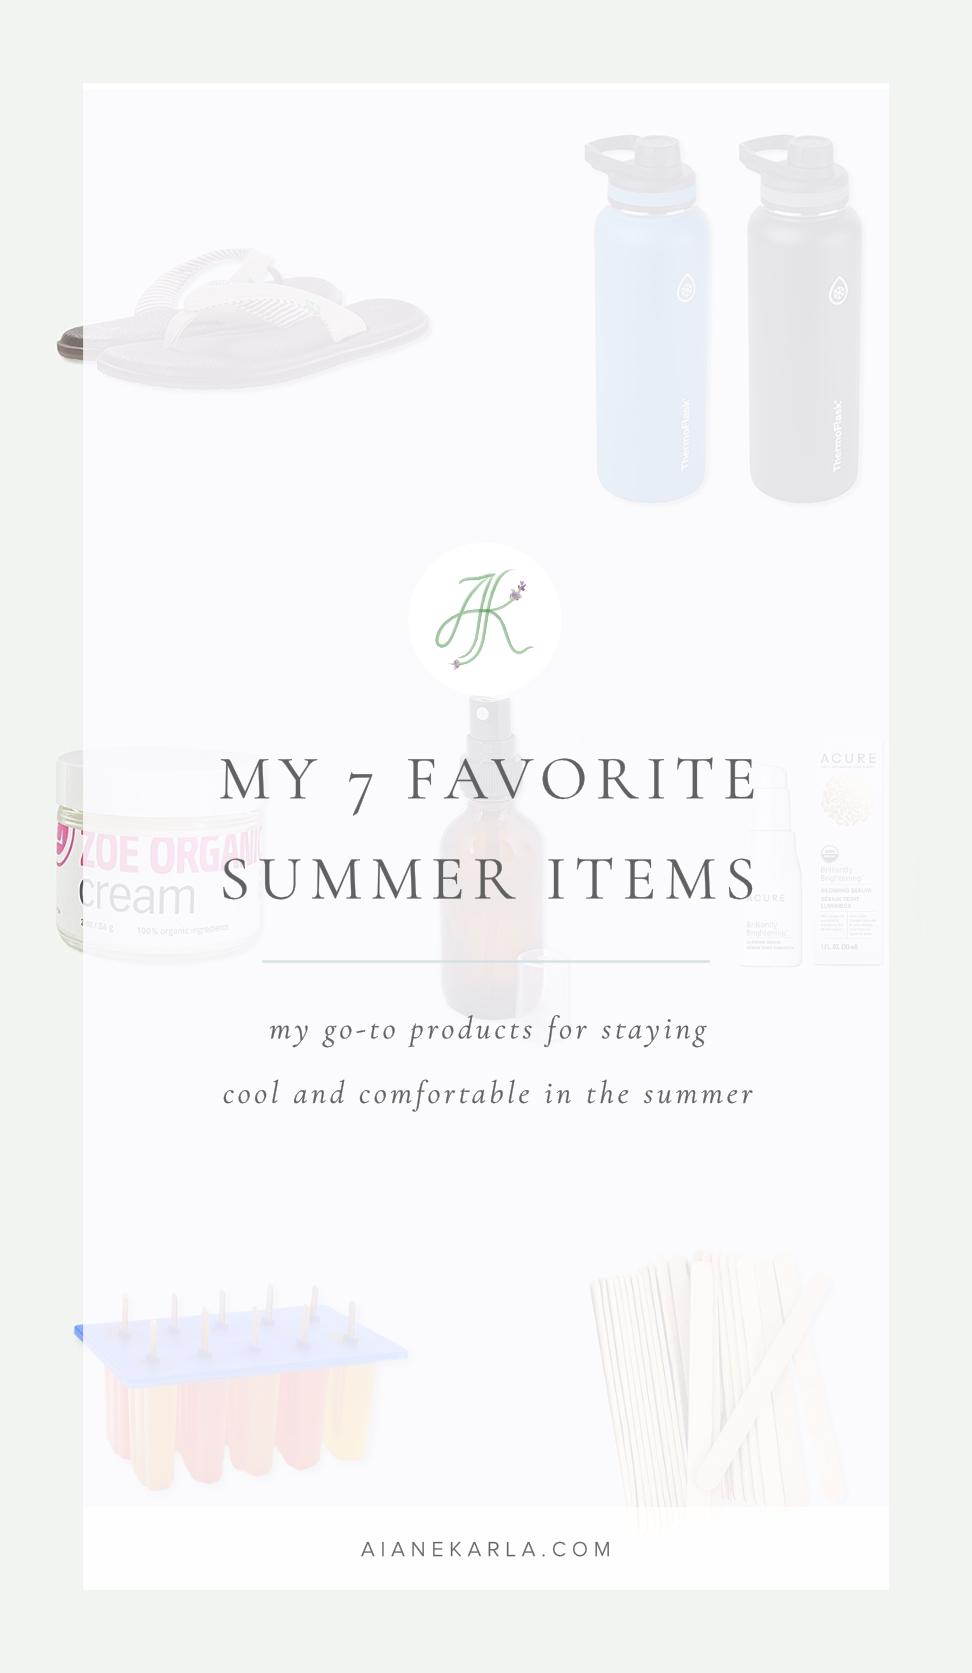 My 7 Favorite Summer Items | Aiane Karla | www.aianekarla.com